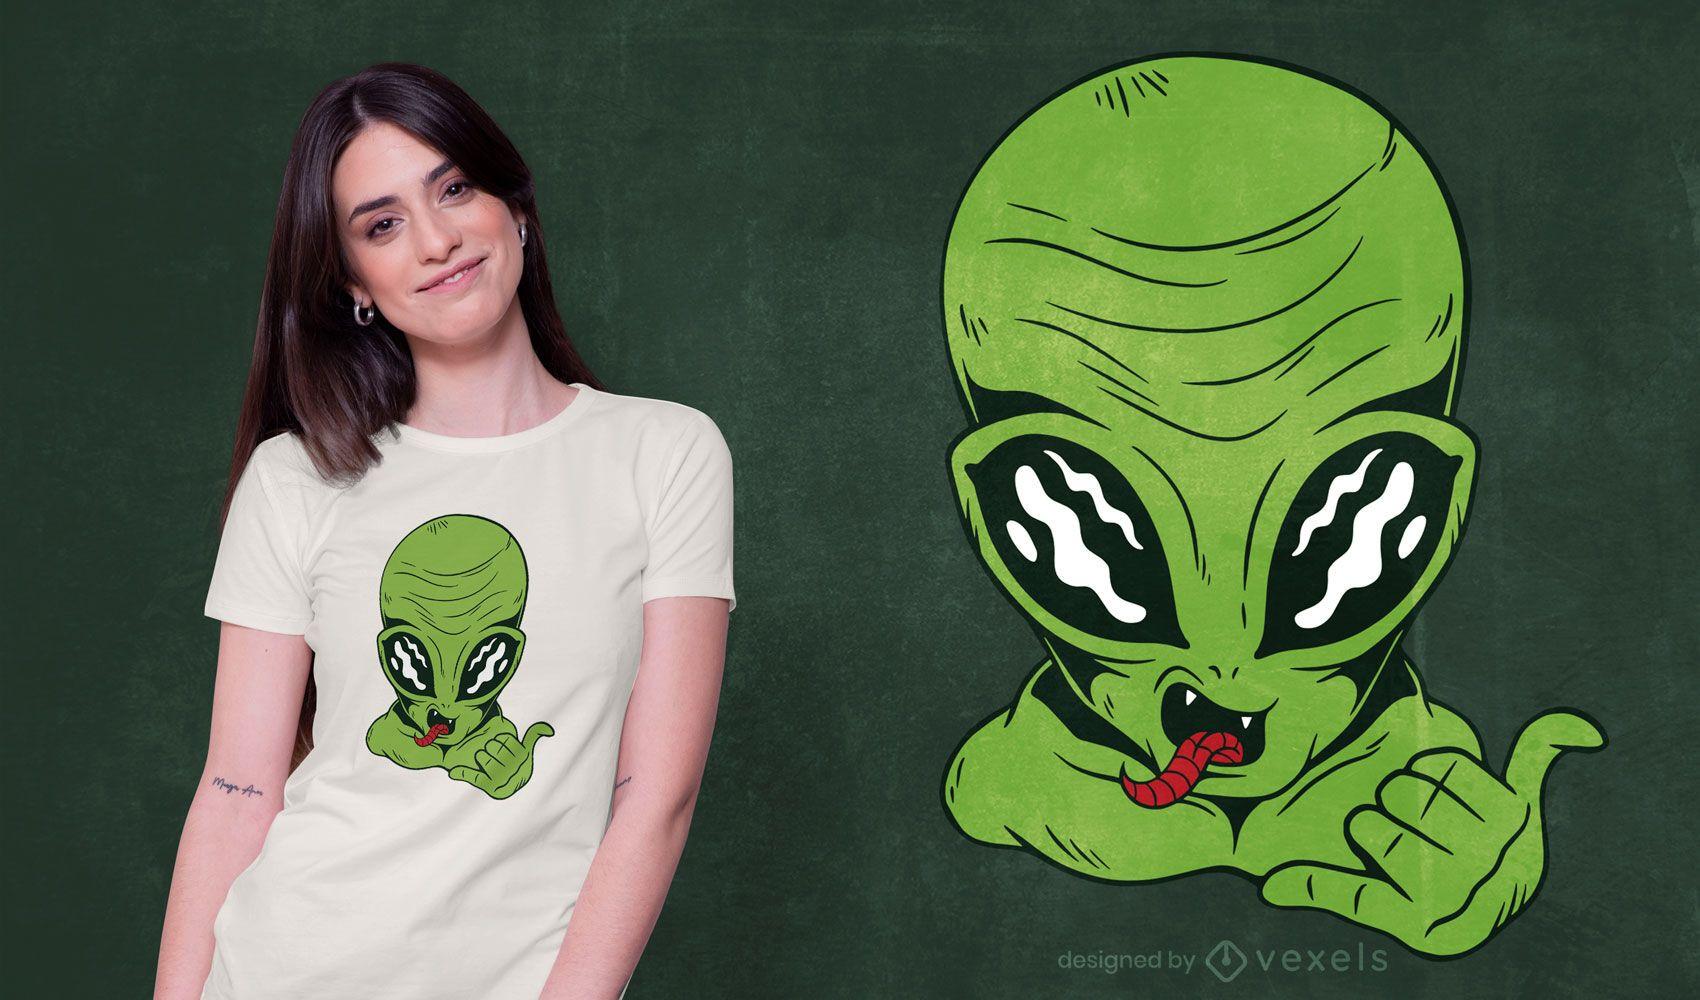 Alien shaka sign t-shirt design